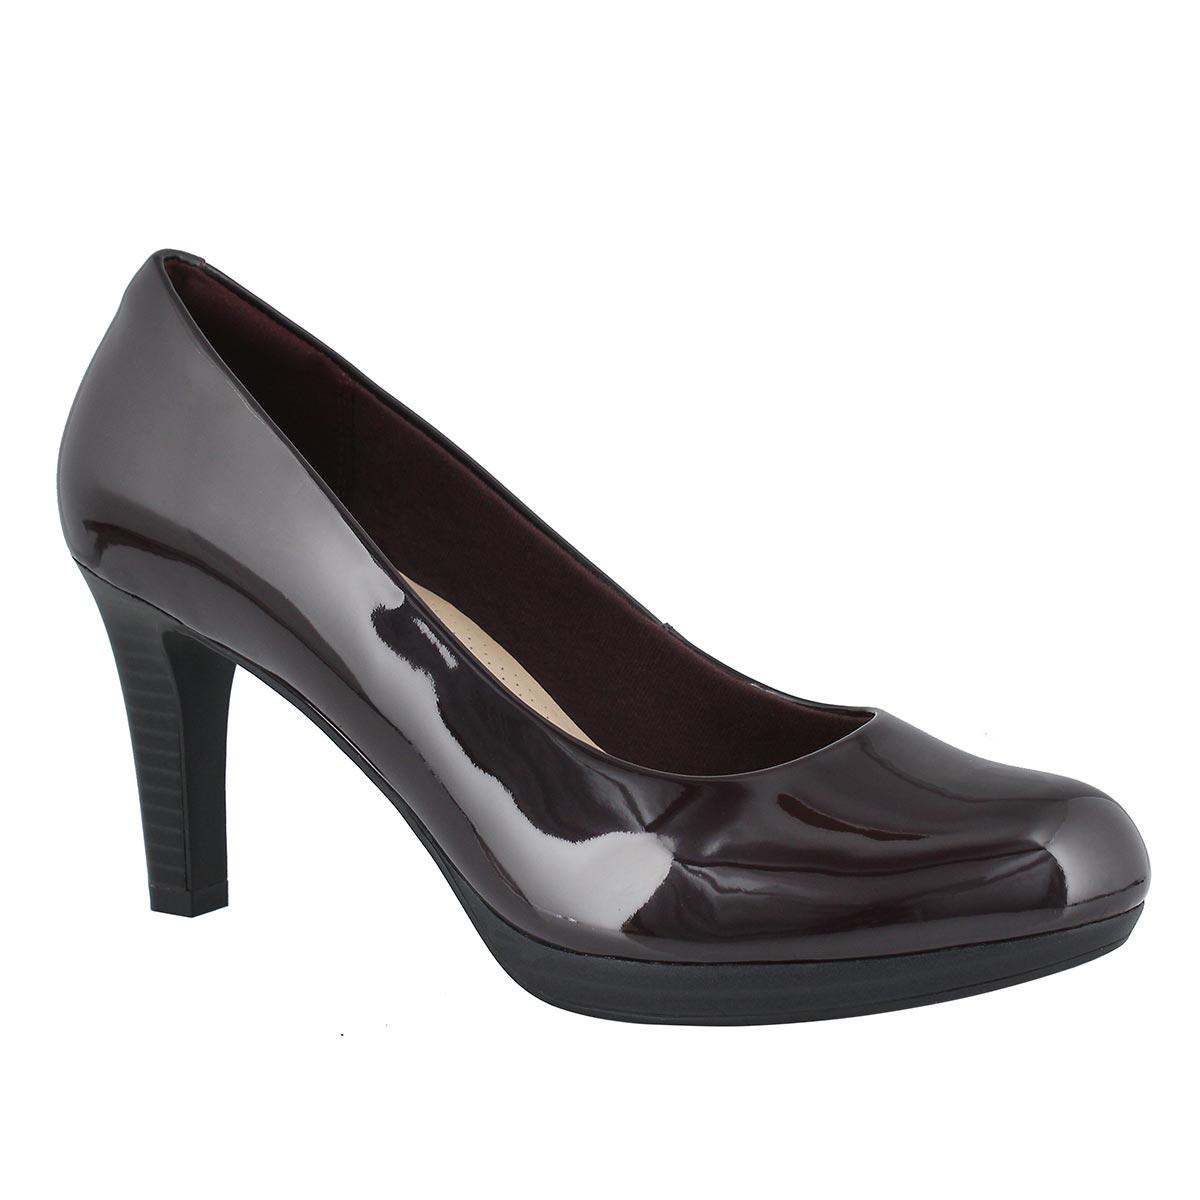 Women's ADRIEL VIOLA aubergine dress heels